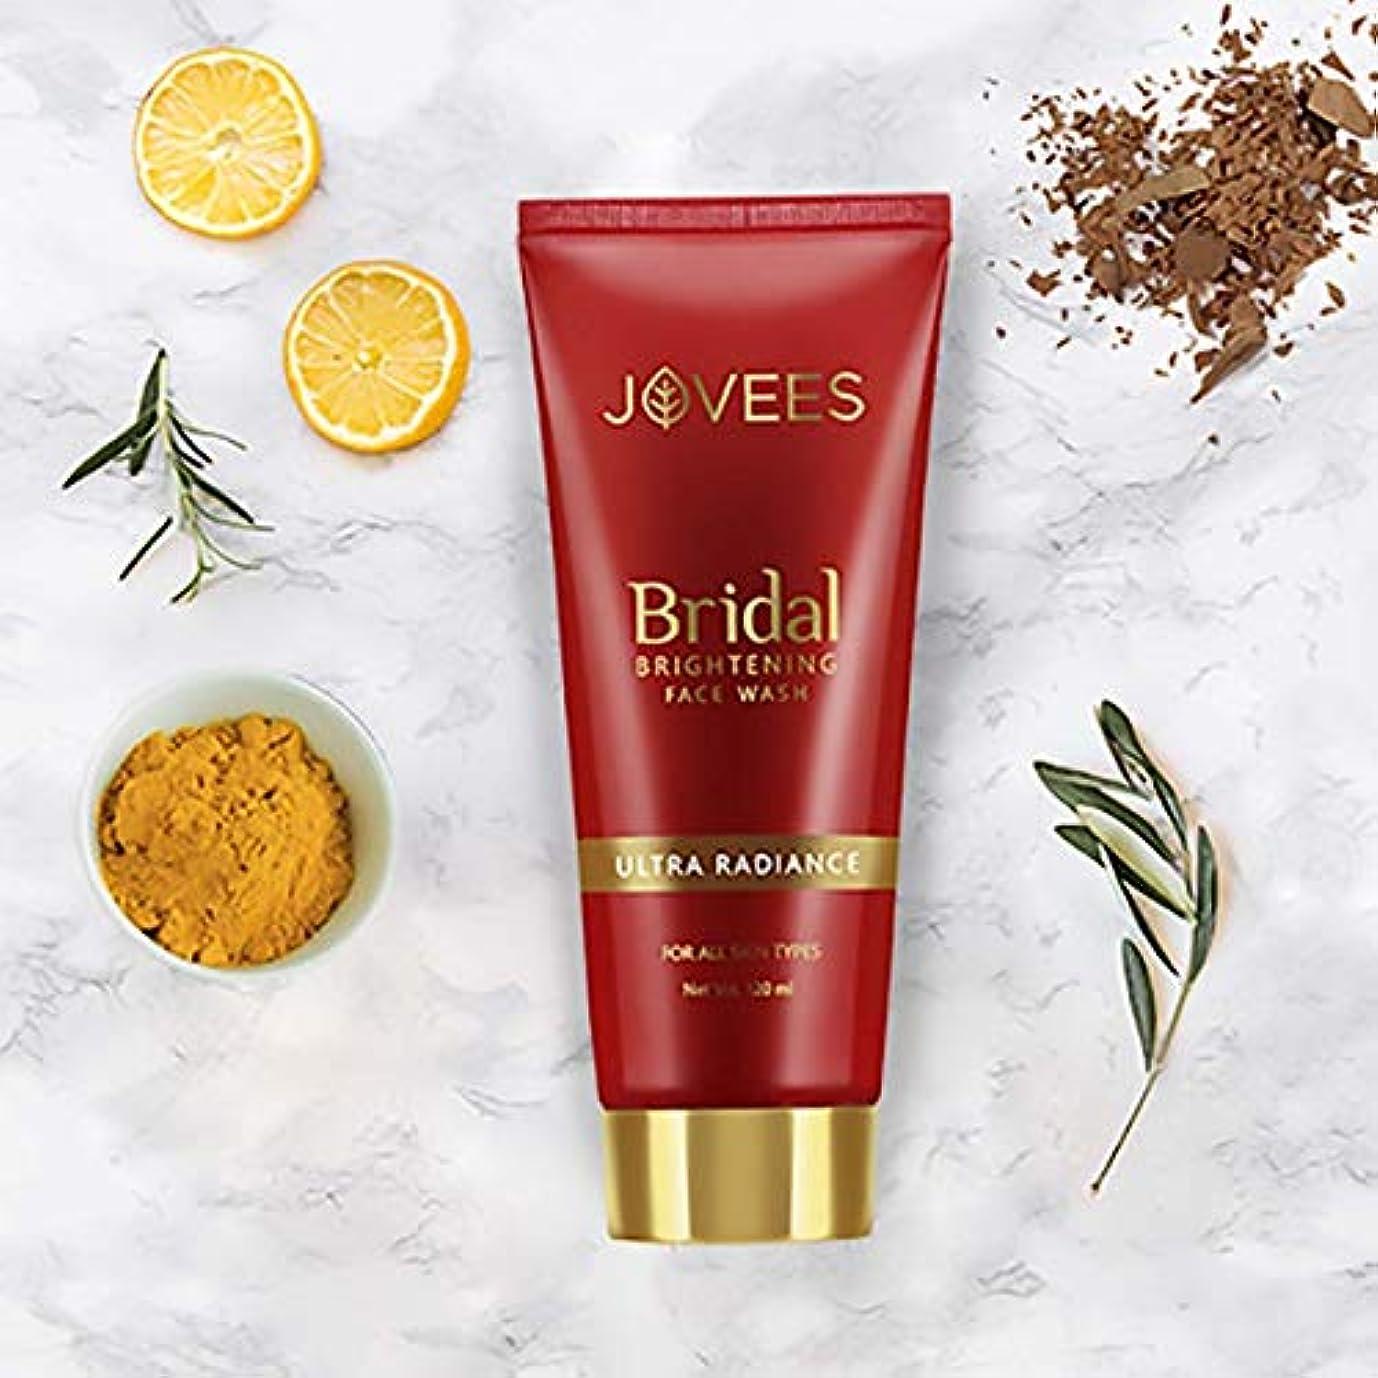 承認石膏負荷Jovees Bridal Brightening Face Wash 120ml Ultra Radiance Even & brighter complex